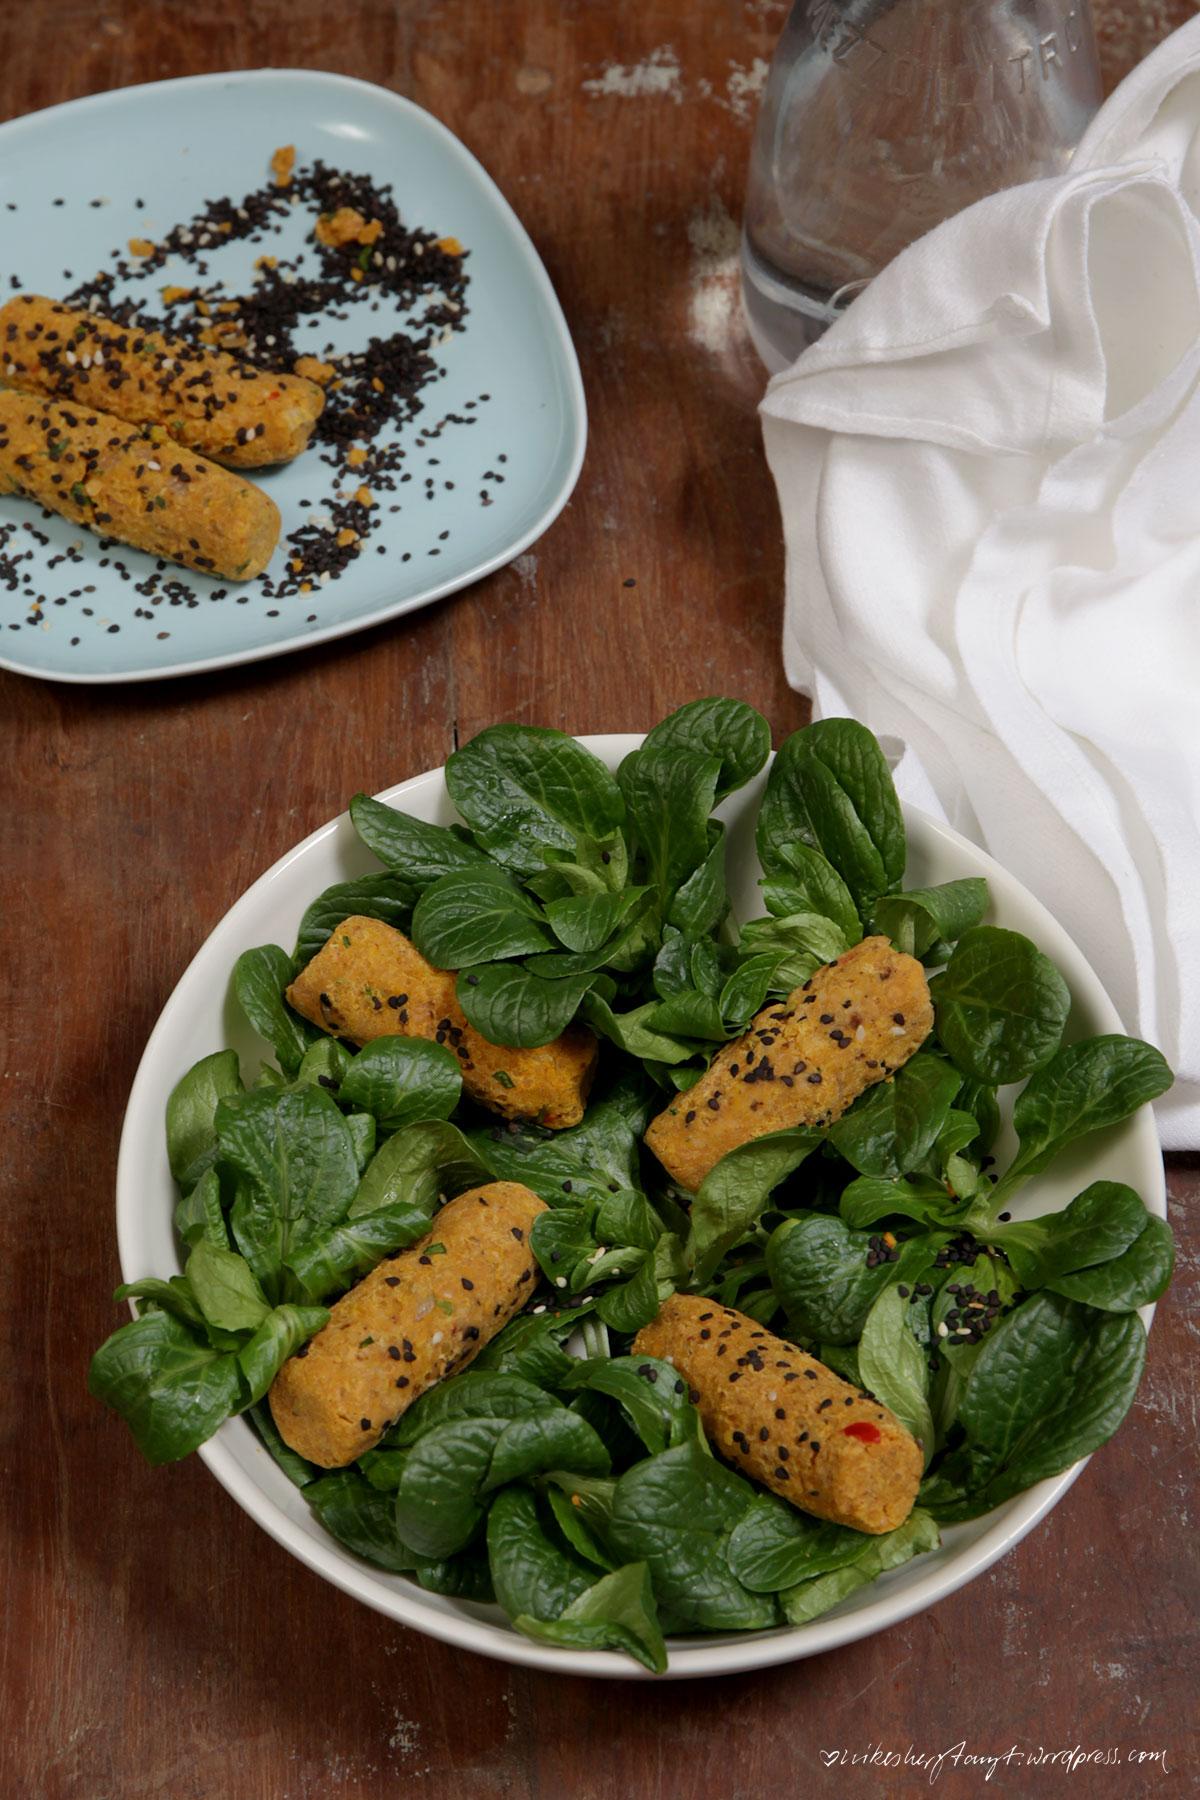 koch dich türkisch, mercimek köftesi, feldsalat, linsen frikadellen, vegan, nikesherztanzt,